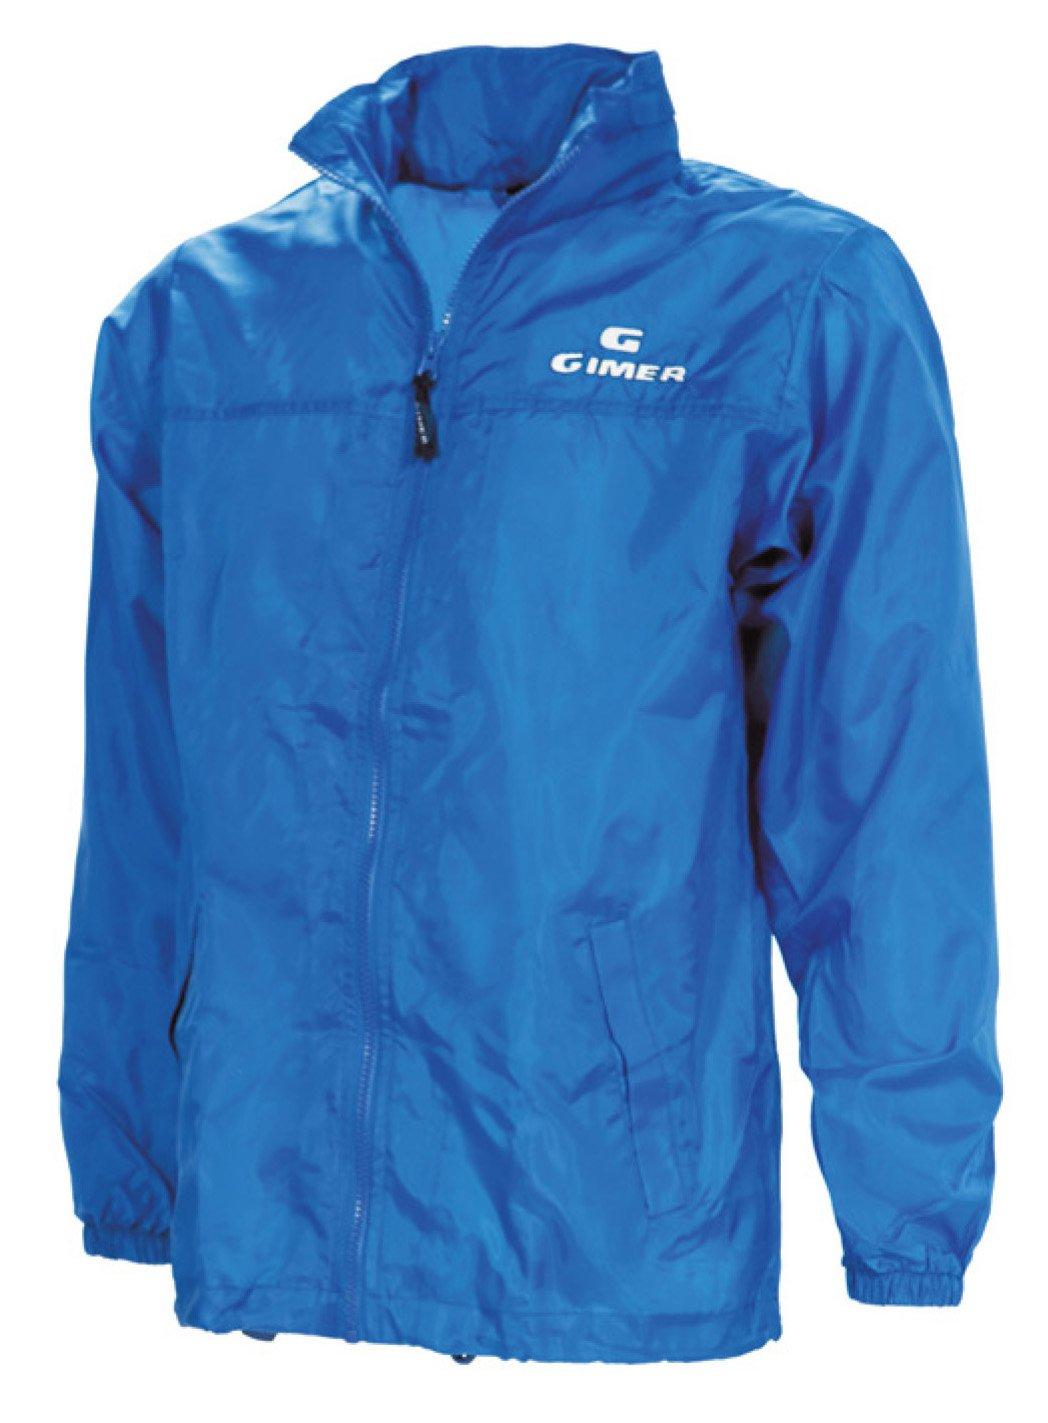 GIMER Vestir Y Accesorios DE Deporte Training Polar Chaqueta Impermeable con Capucha INSERTAR/Á 173//7